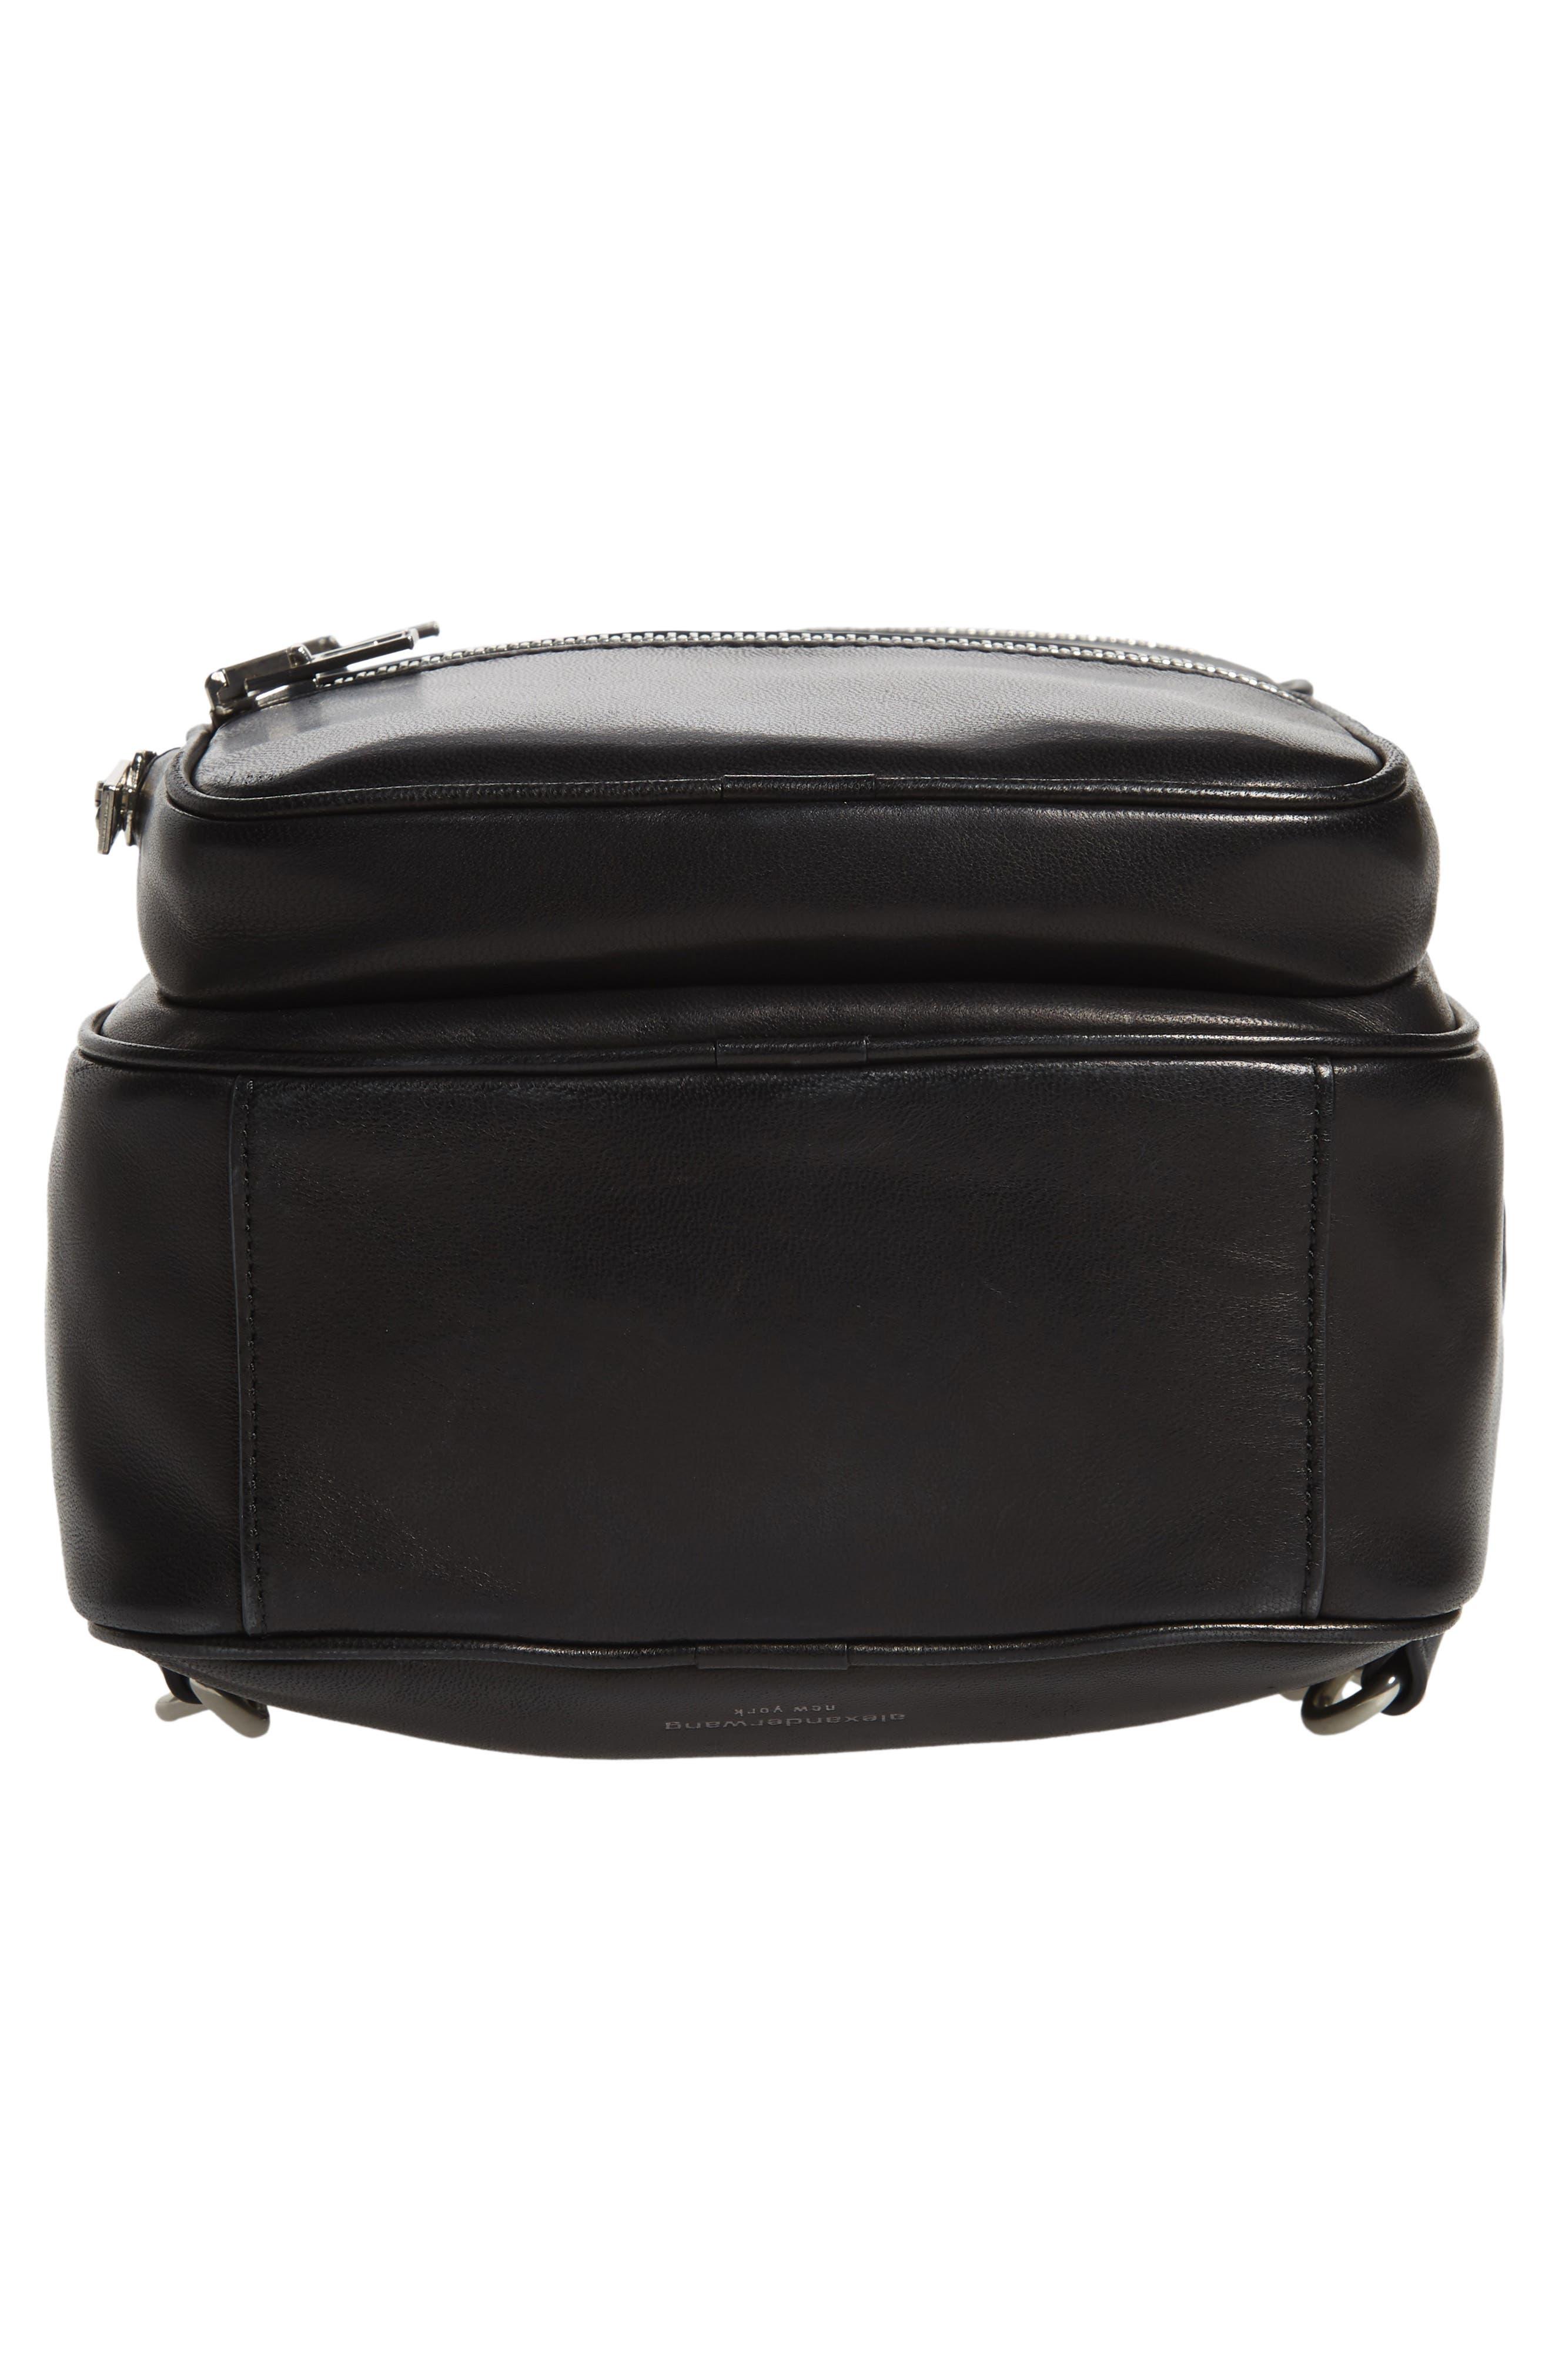 ALEXANDER WANG, Attica Lambskin Leather Backpack, Alternate thumbnail 6, color, BLACK